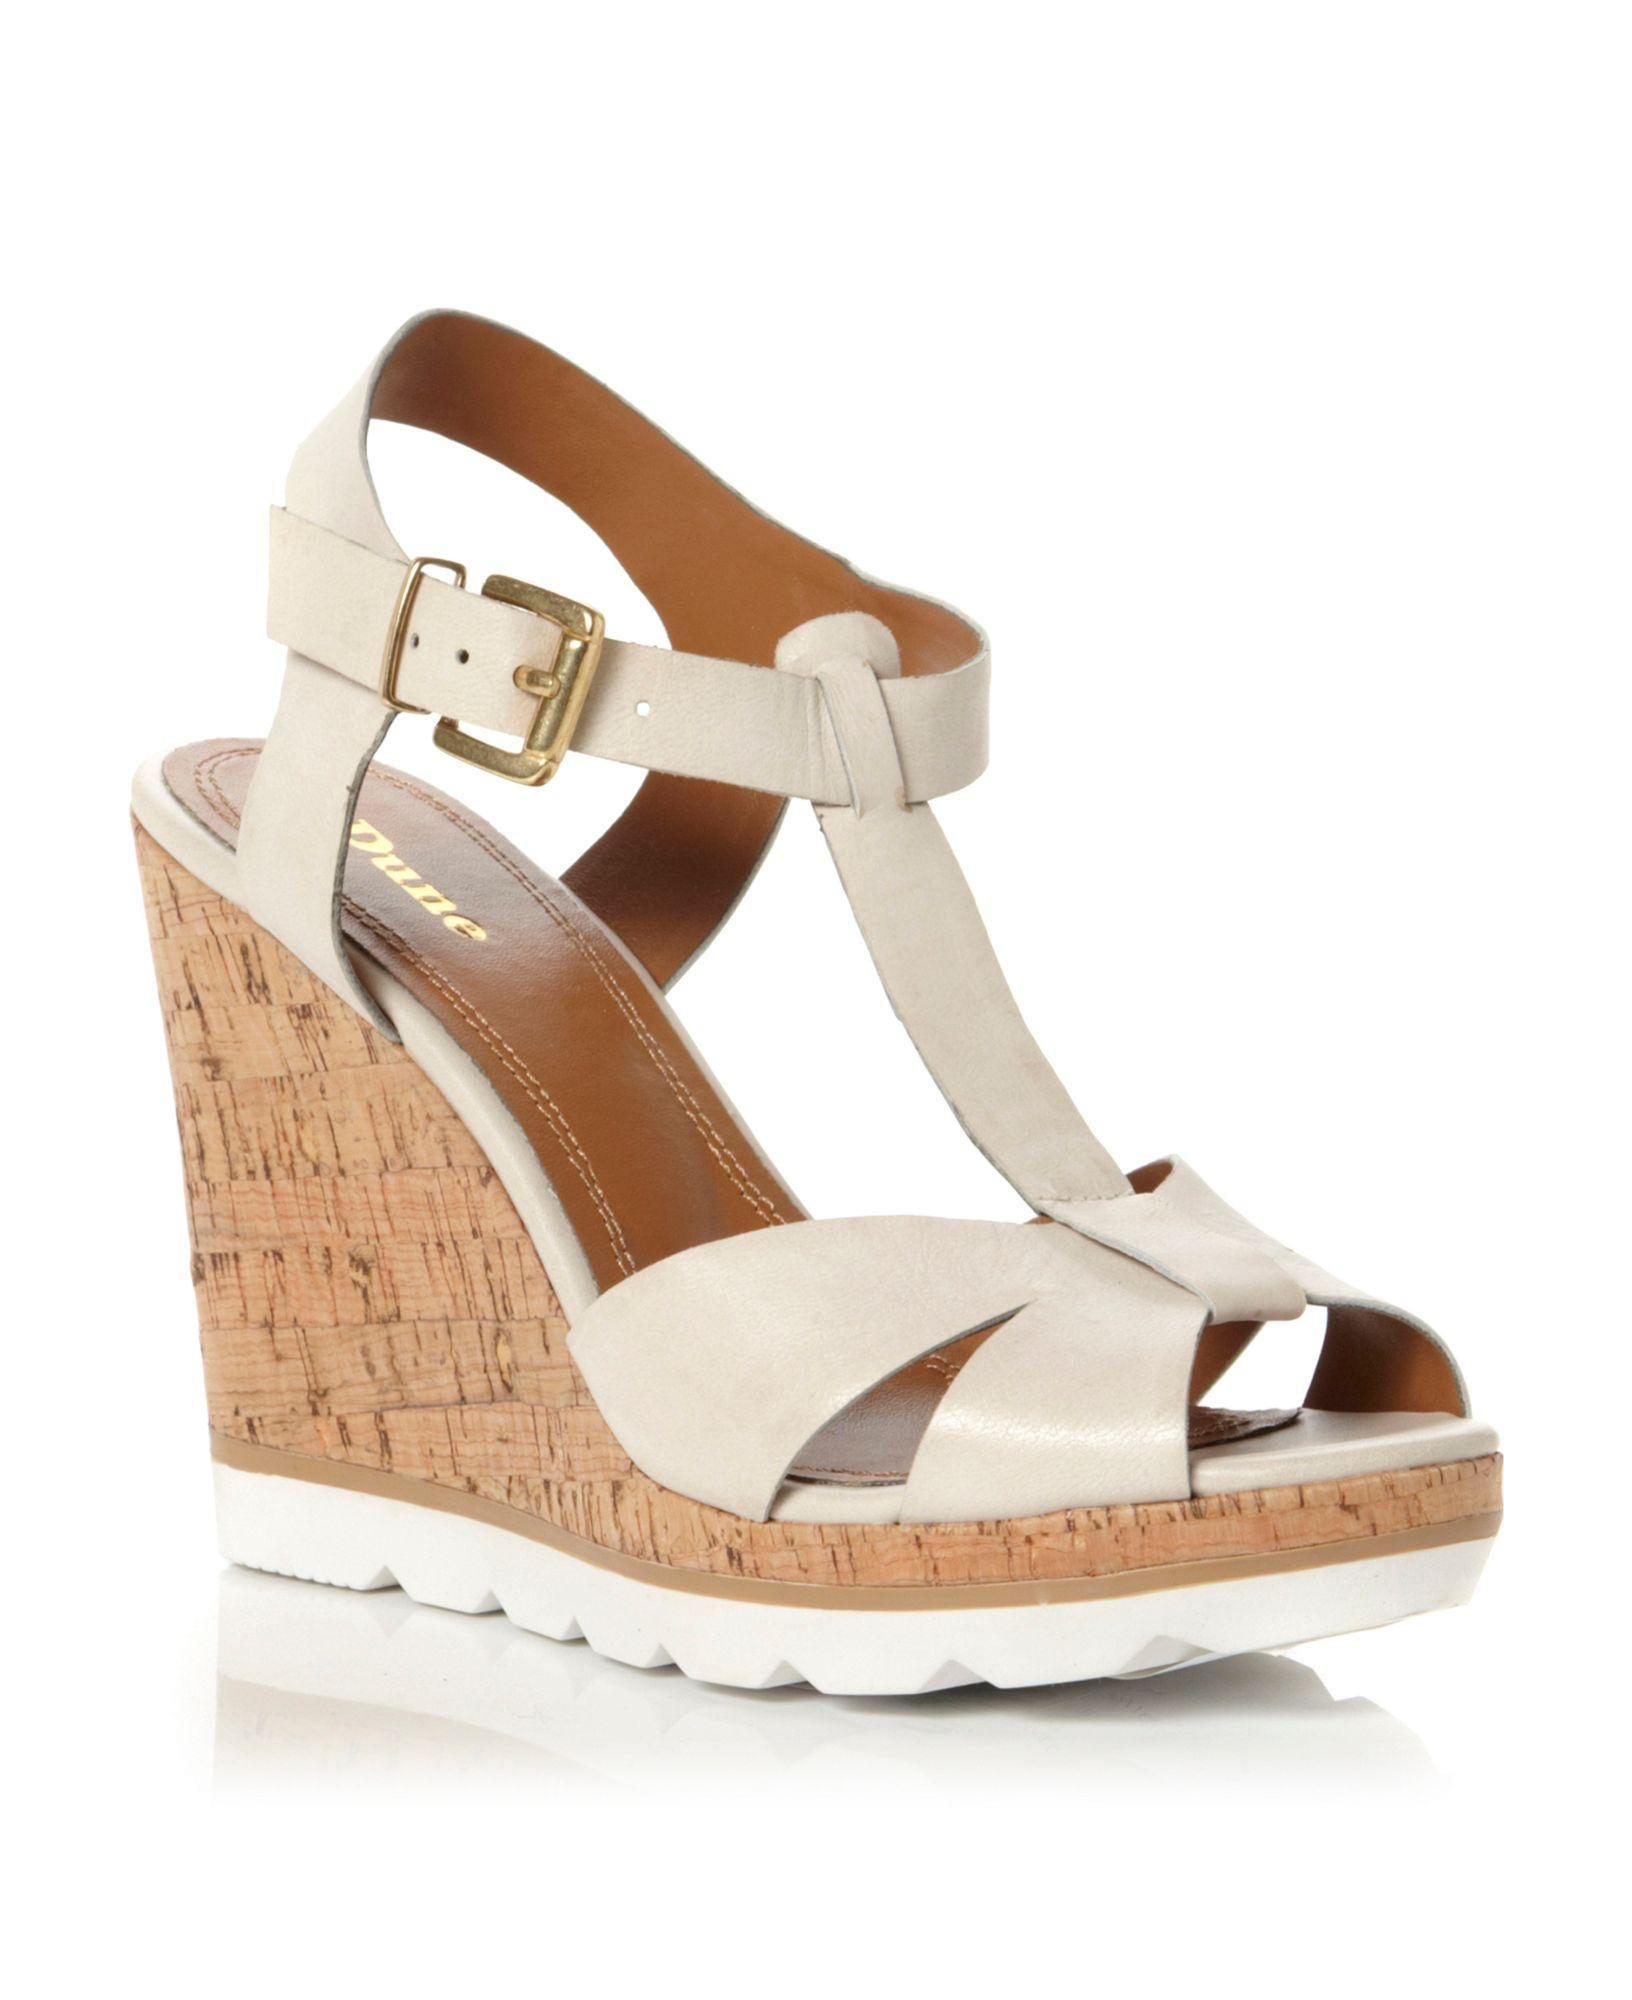 dune giraffe tbar wedge shoes in white white lyst